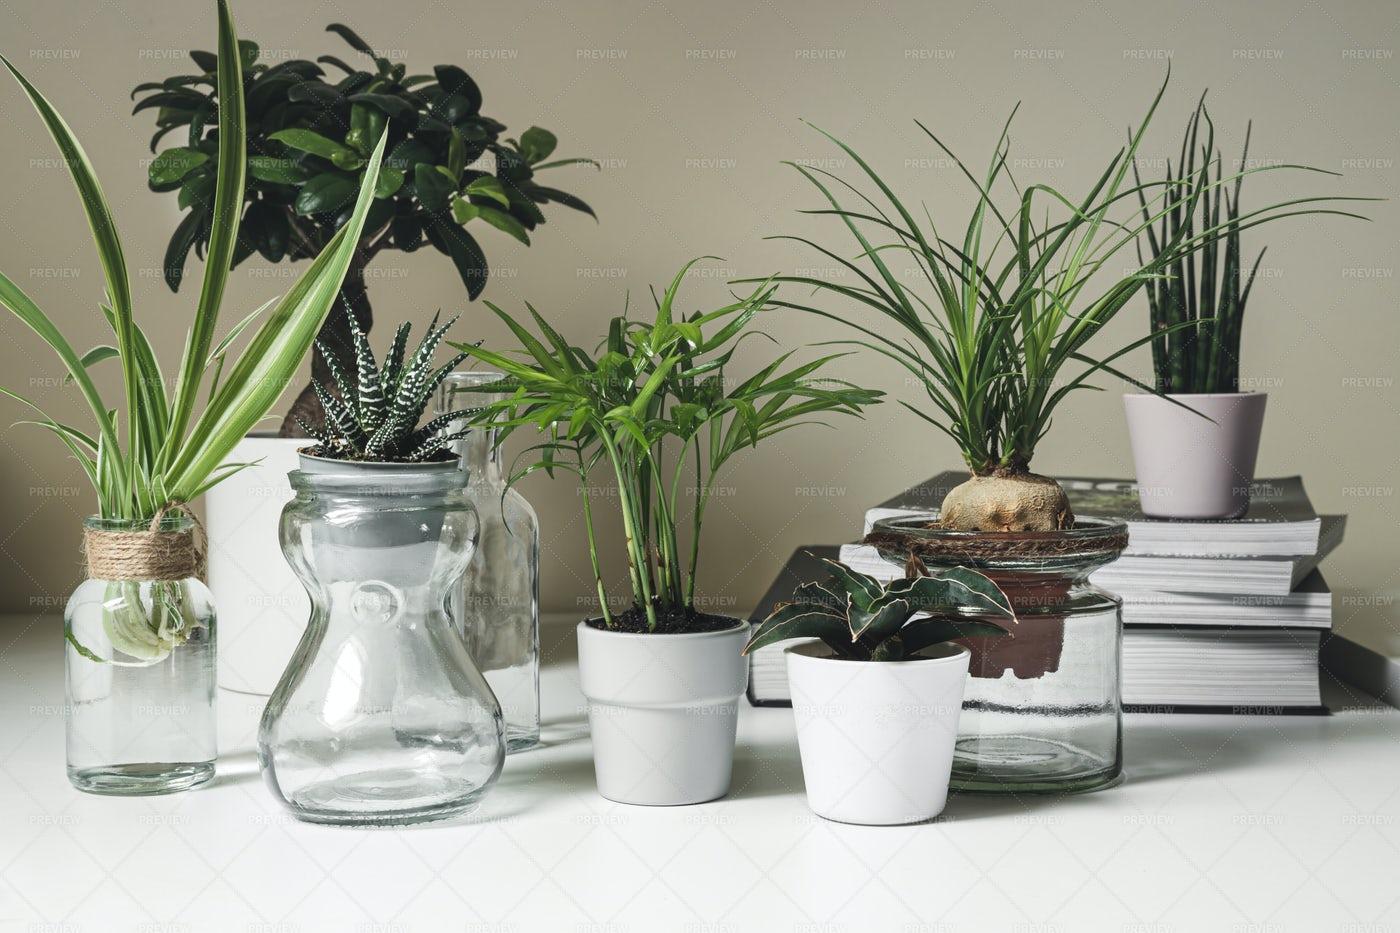 Mini Plants In Pots: Stock Photos